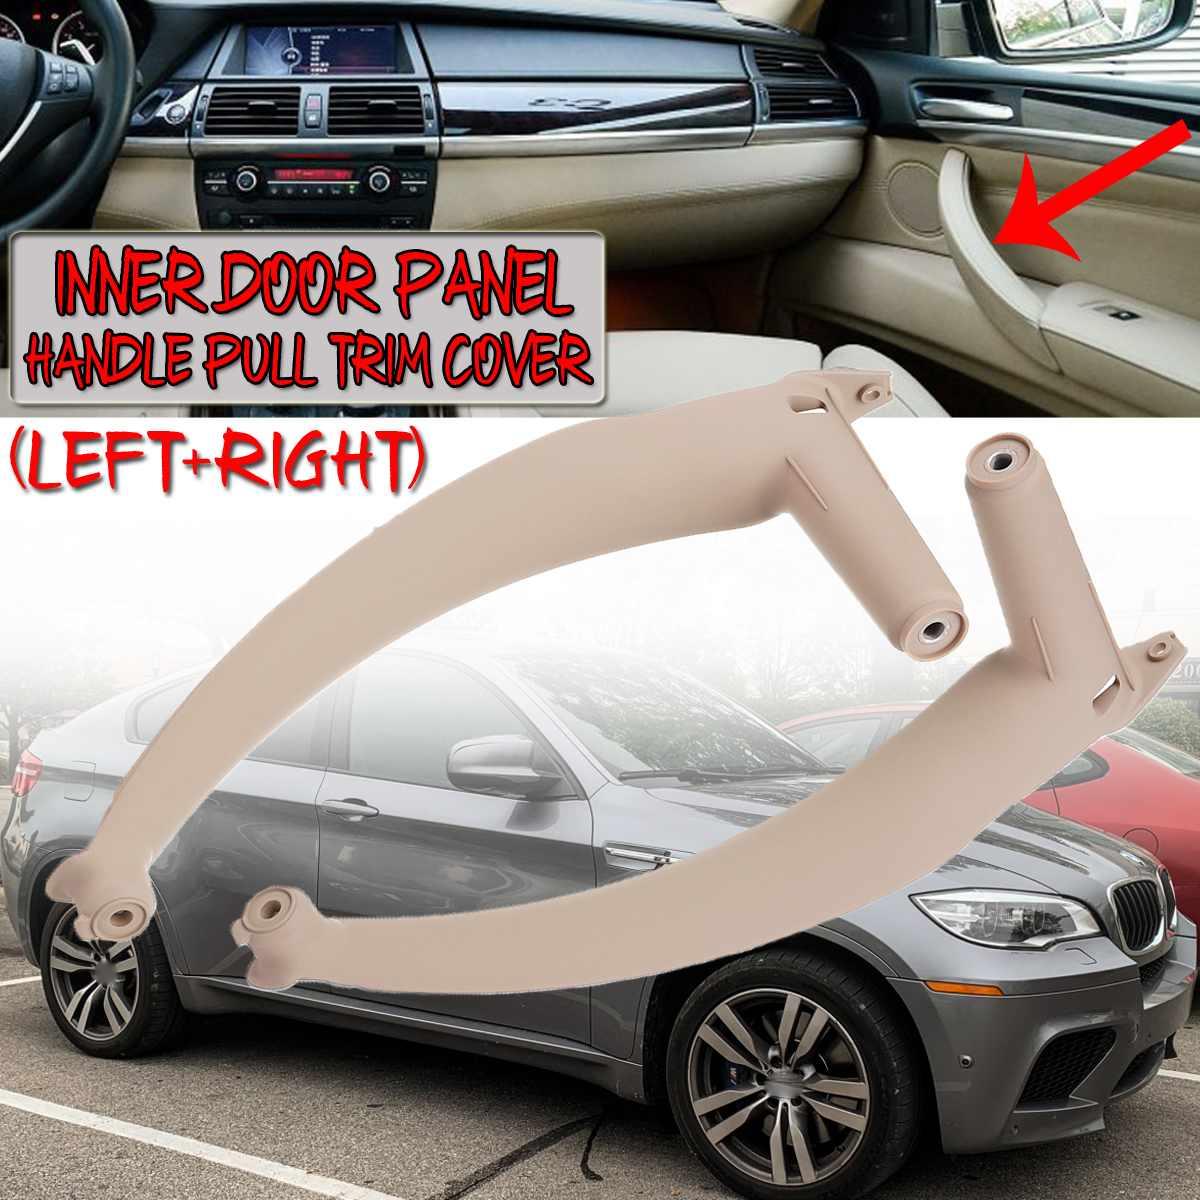 For BMW E70 X5 2007-2014 Passenger Right Inner Door Panel Handle Pull Trim Cover